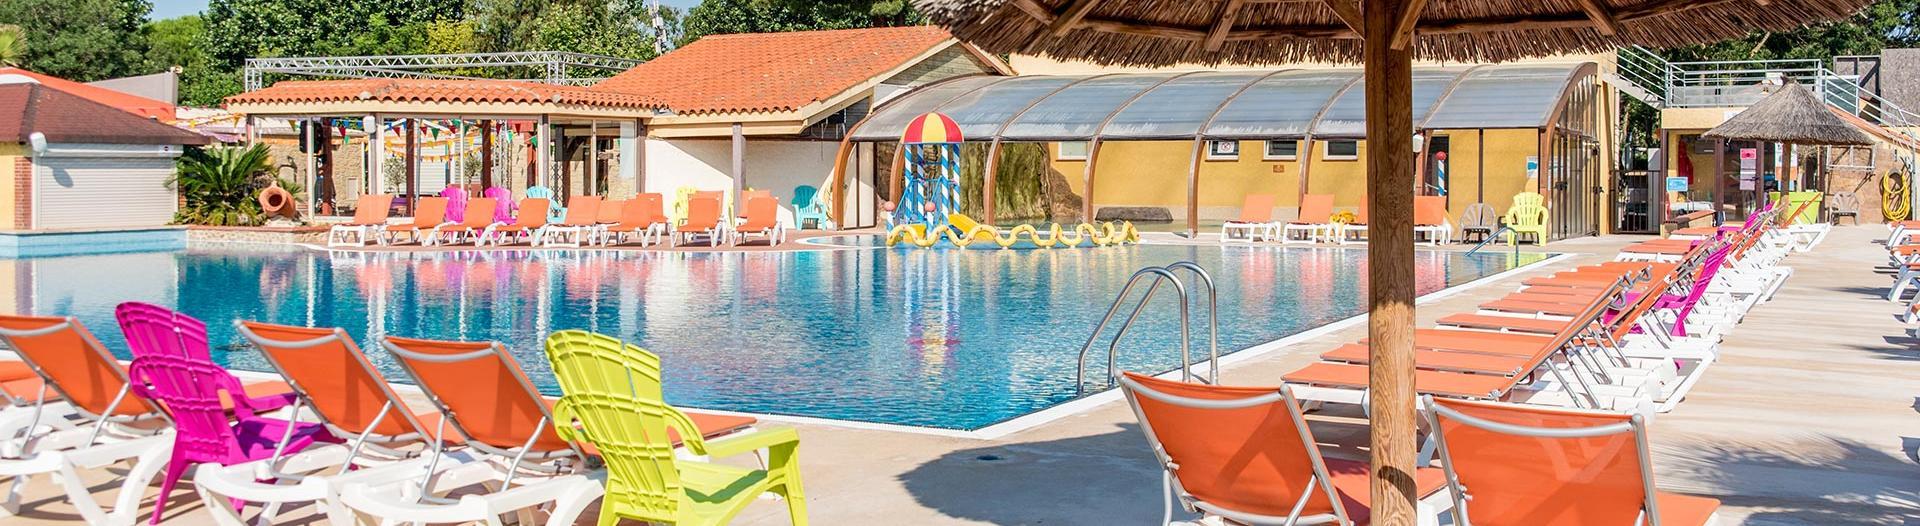 slider-camping-le-littoral-argeles-sur-mer-piscine